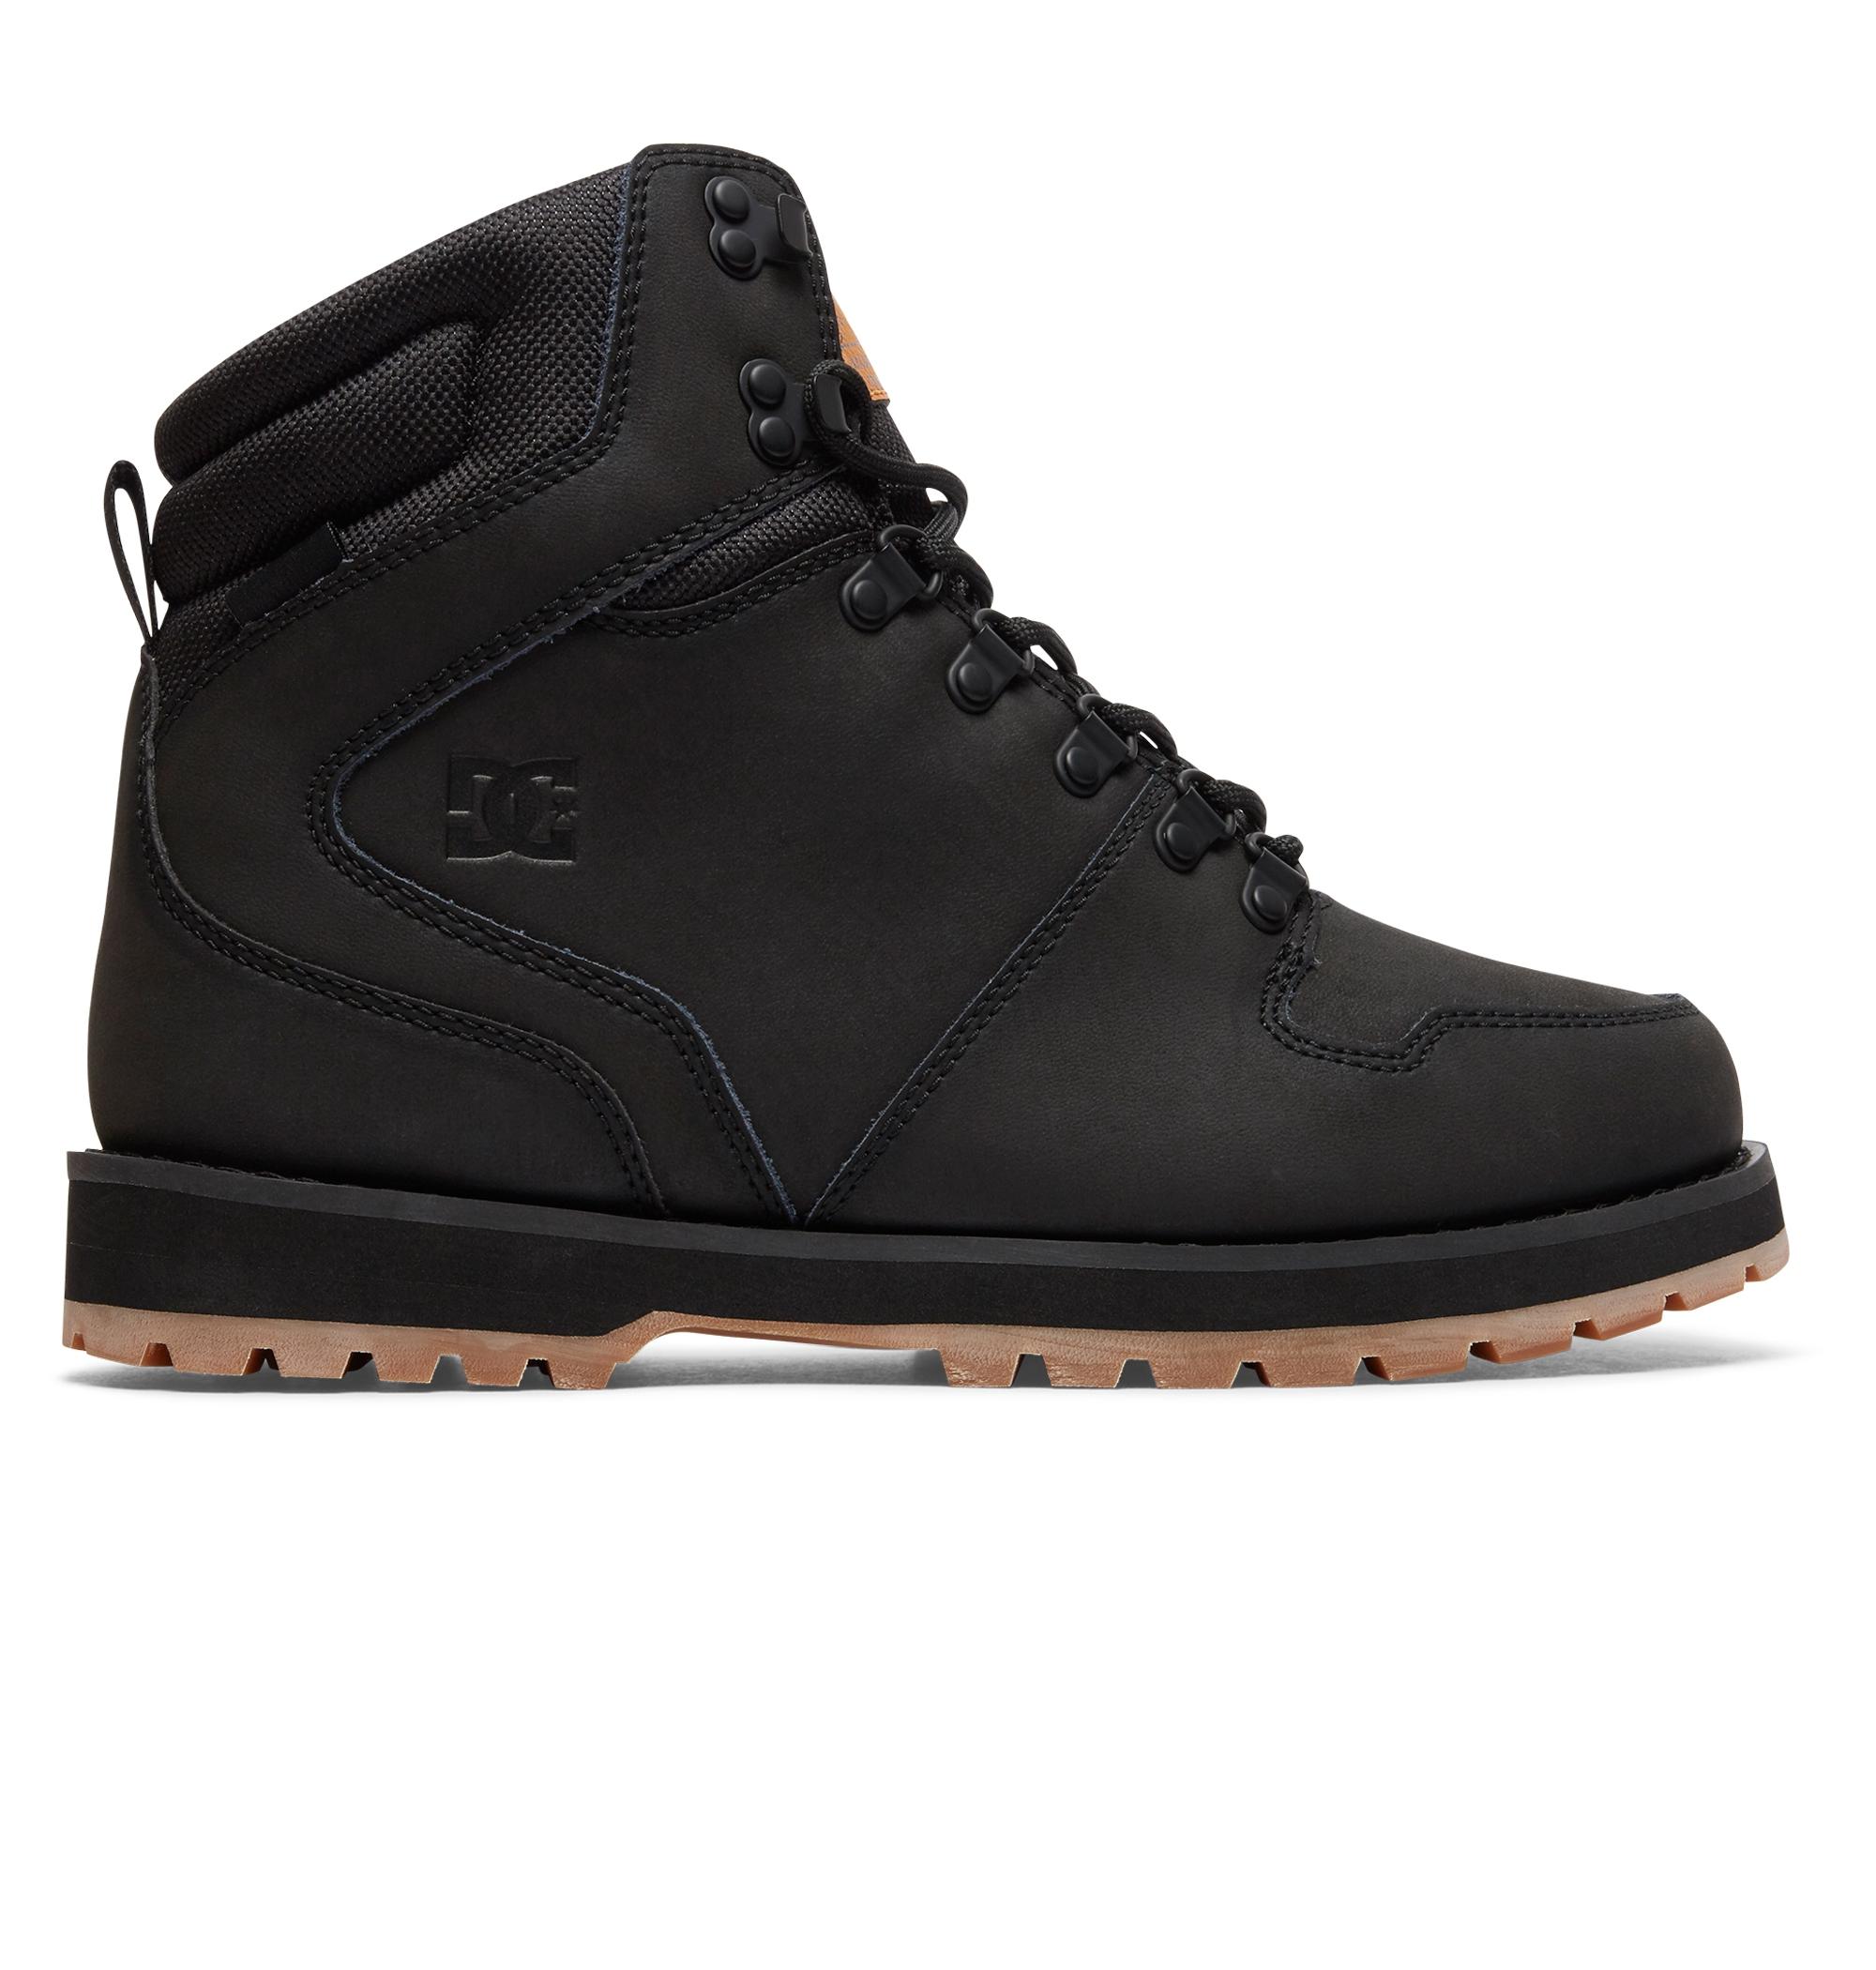 Dc Shoes Peary Boot Black/Gum : Men's